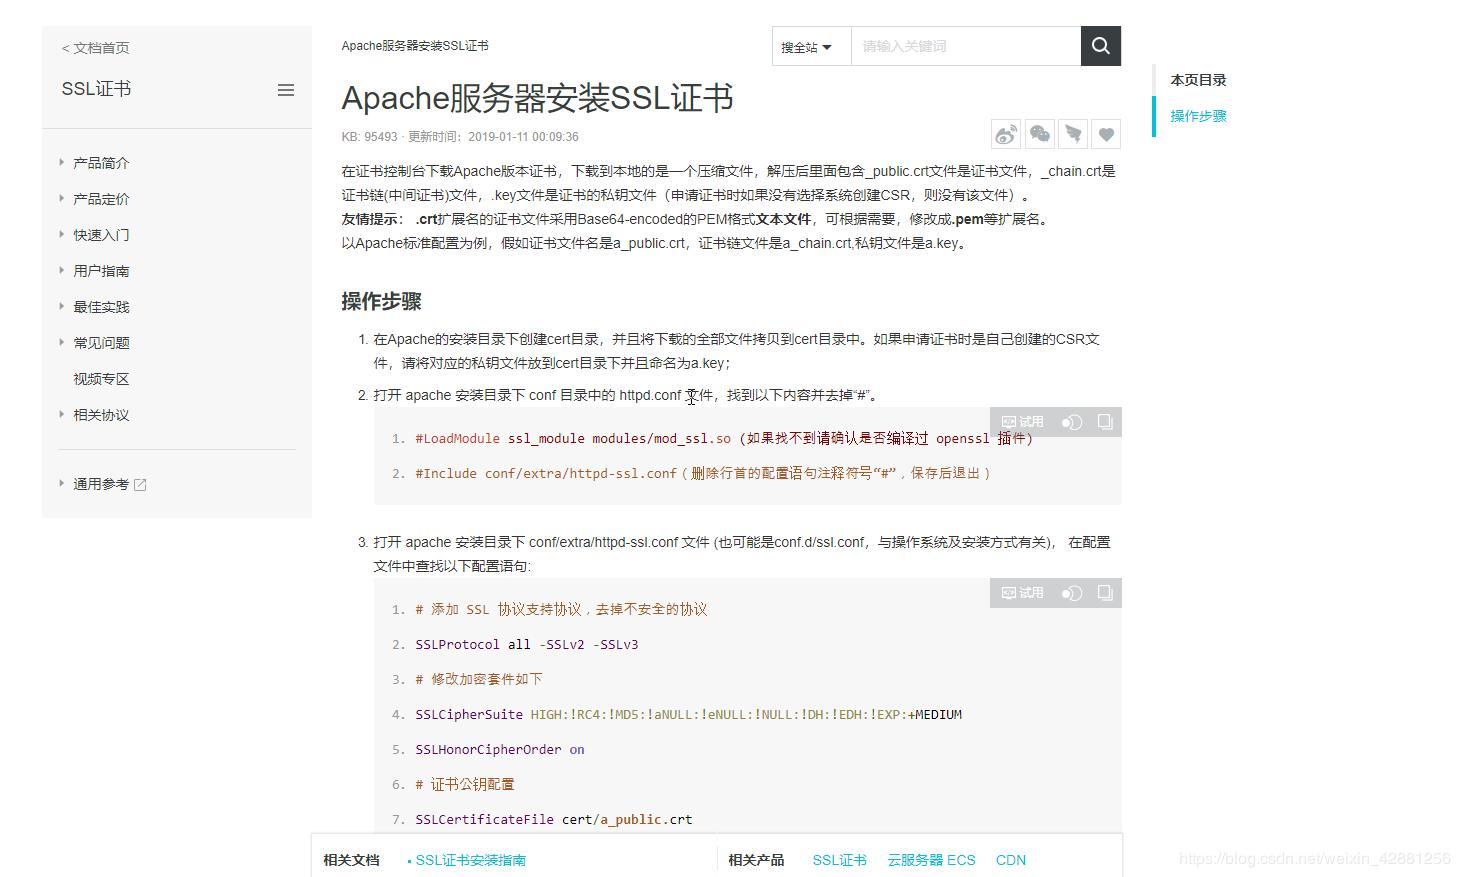 Apache configuration ssl website certificate - Programmer Sought